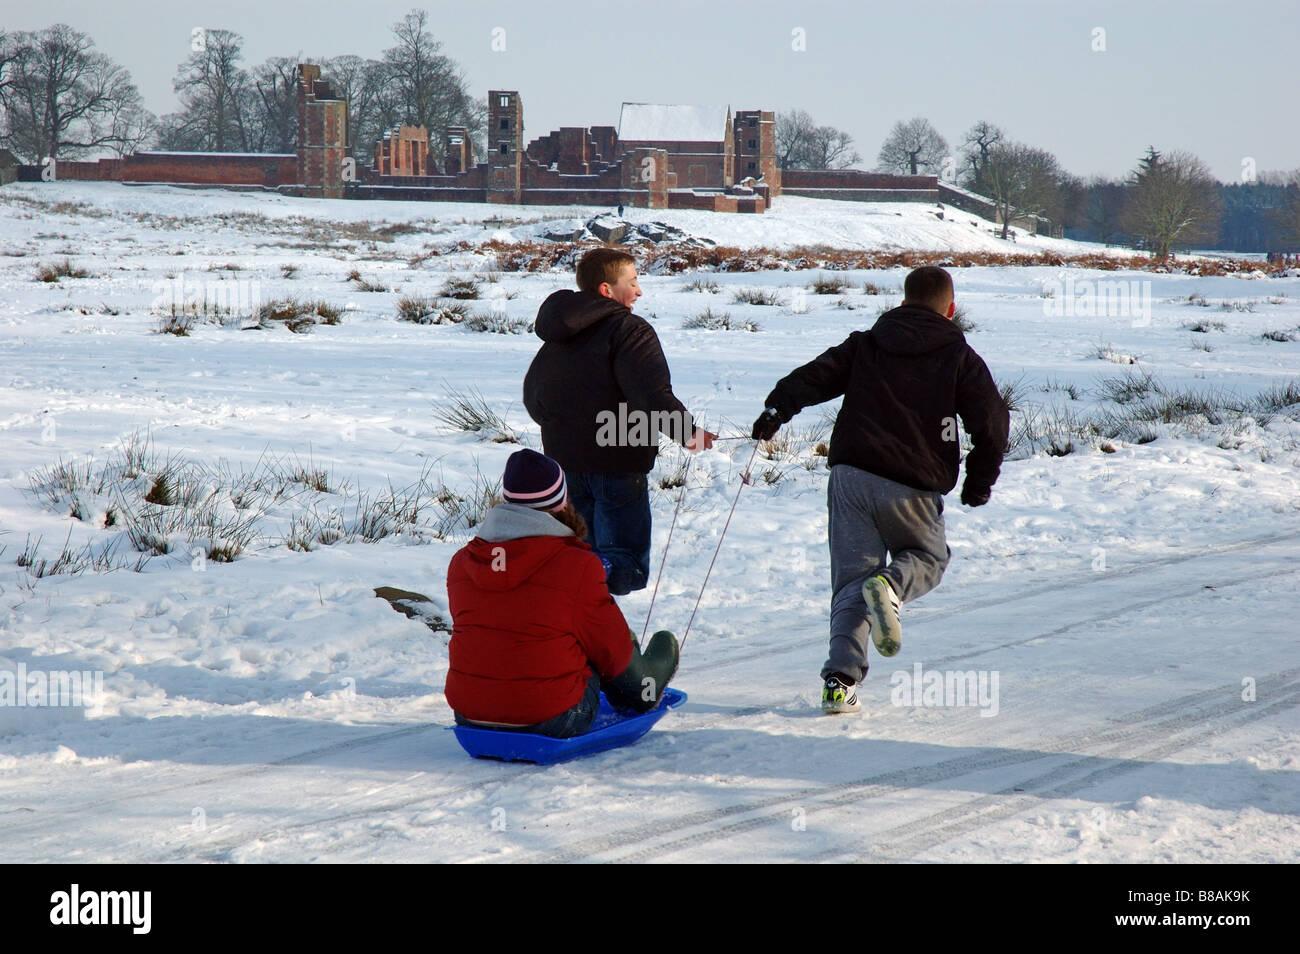 children pulling sledge, Bradgate Park, Leicestershire, England, UK - Stock Image